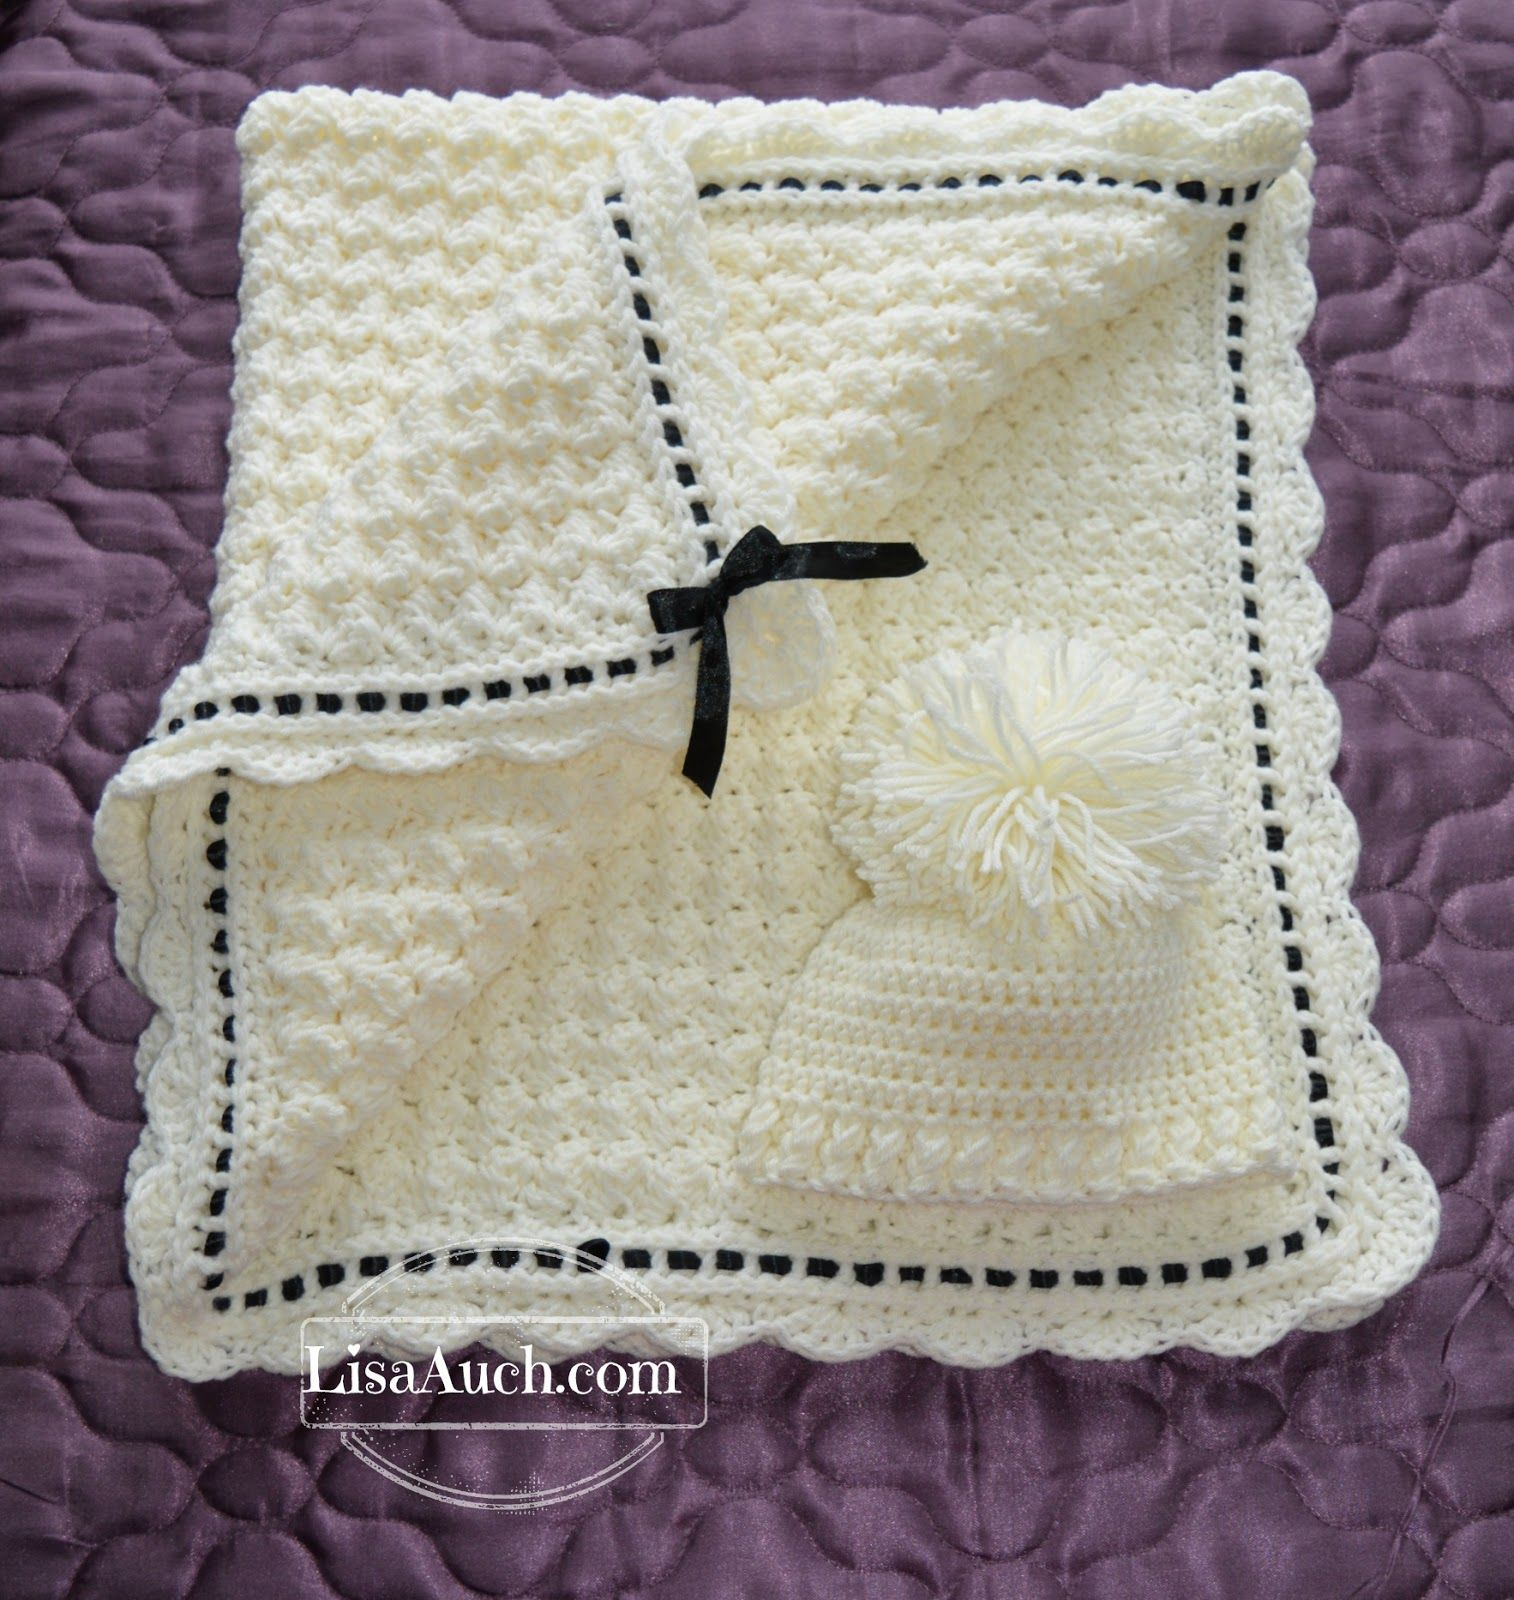 Crochet Baby Blanket Crochet Baby Hat Pattern Crochet Hat And